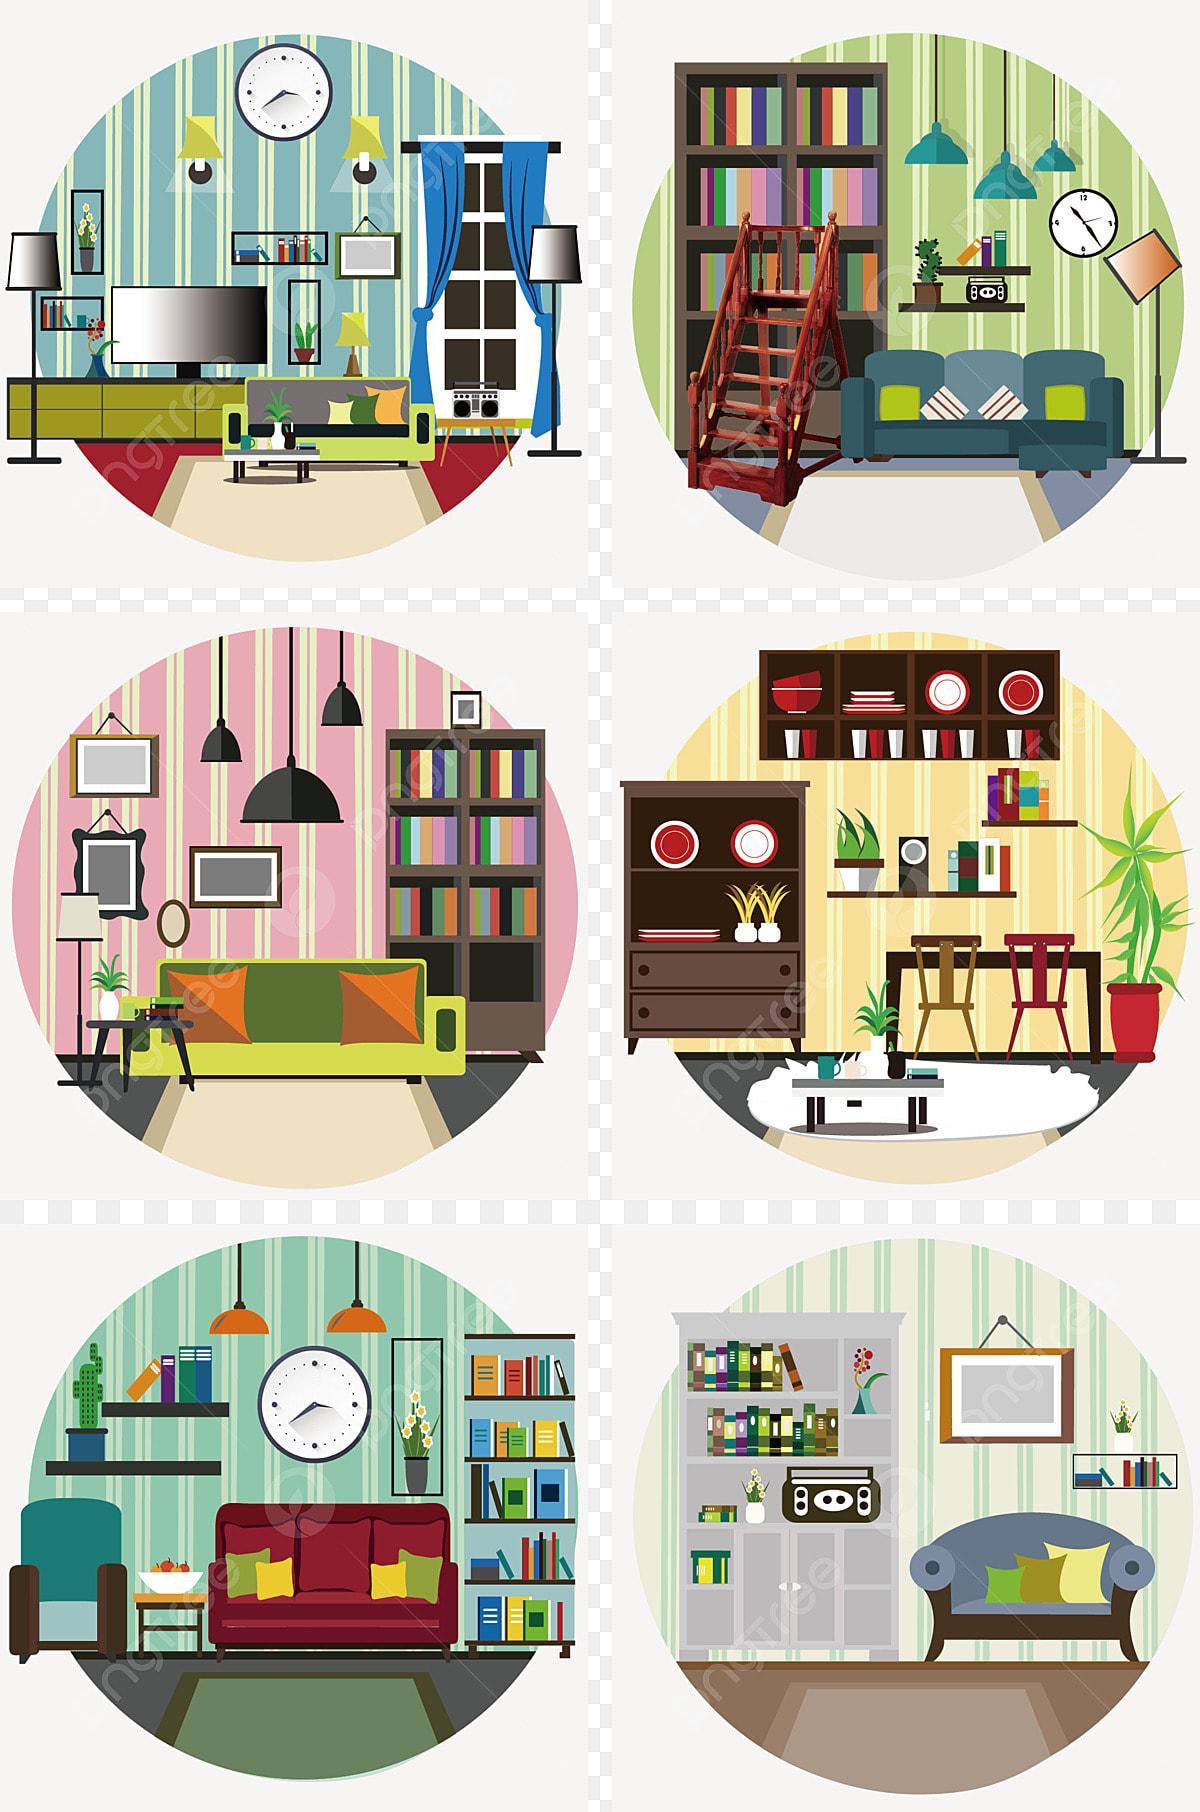 decoraciones de esquina para sala de estar Sala De Estar Decoracion De Muebles Casa Sencilla Decoracin